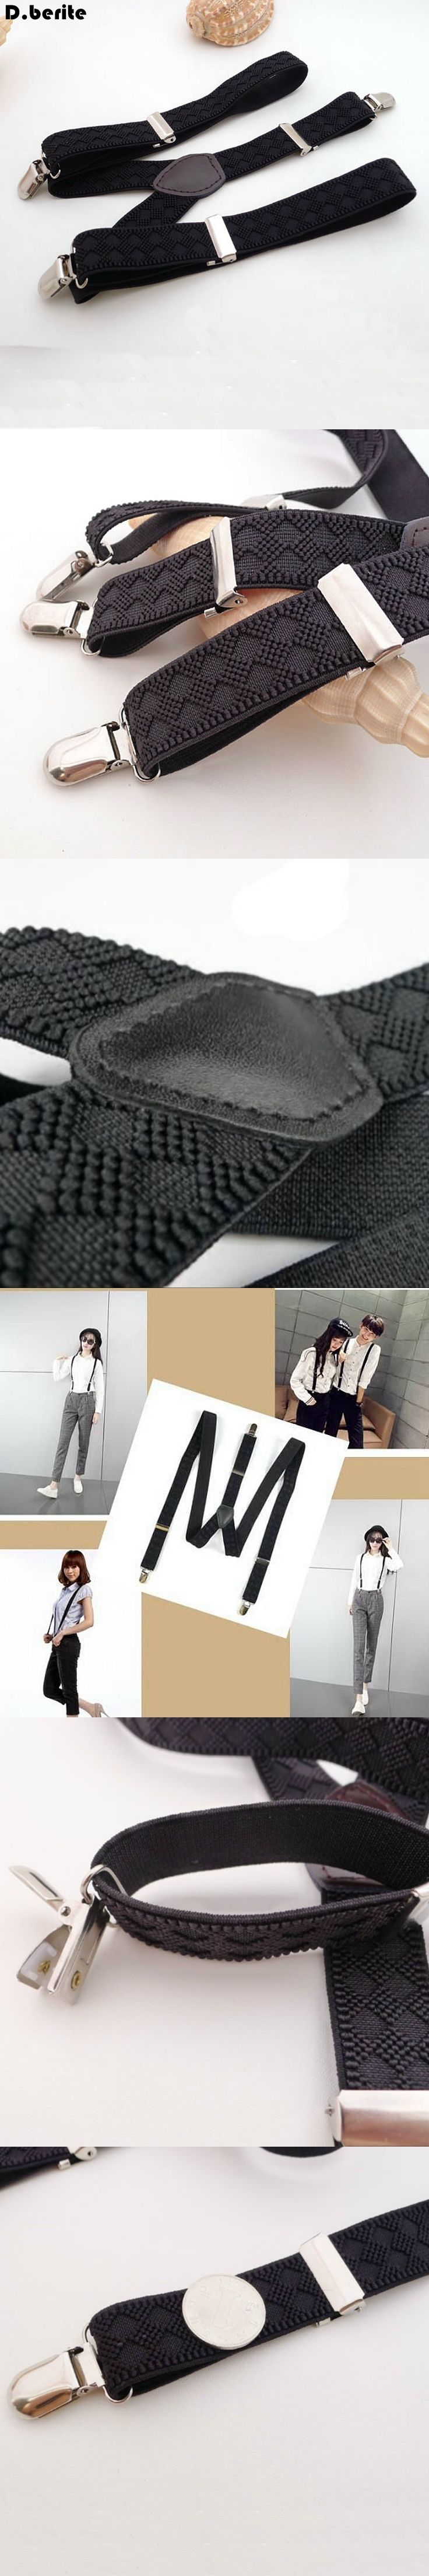 Casual Mens Black Braces Unisex Adjustable Clip-on Suspenders Clip Braces Adult Belt Strap For Wedding Party BDXJ2514